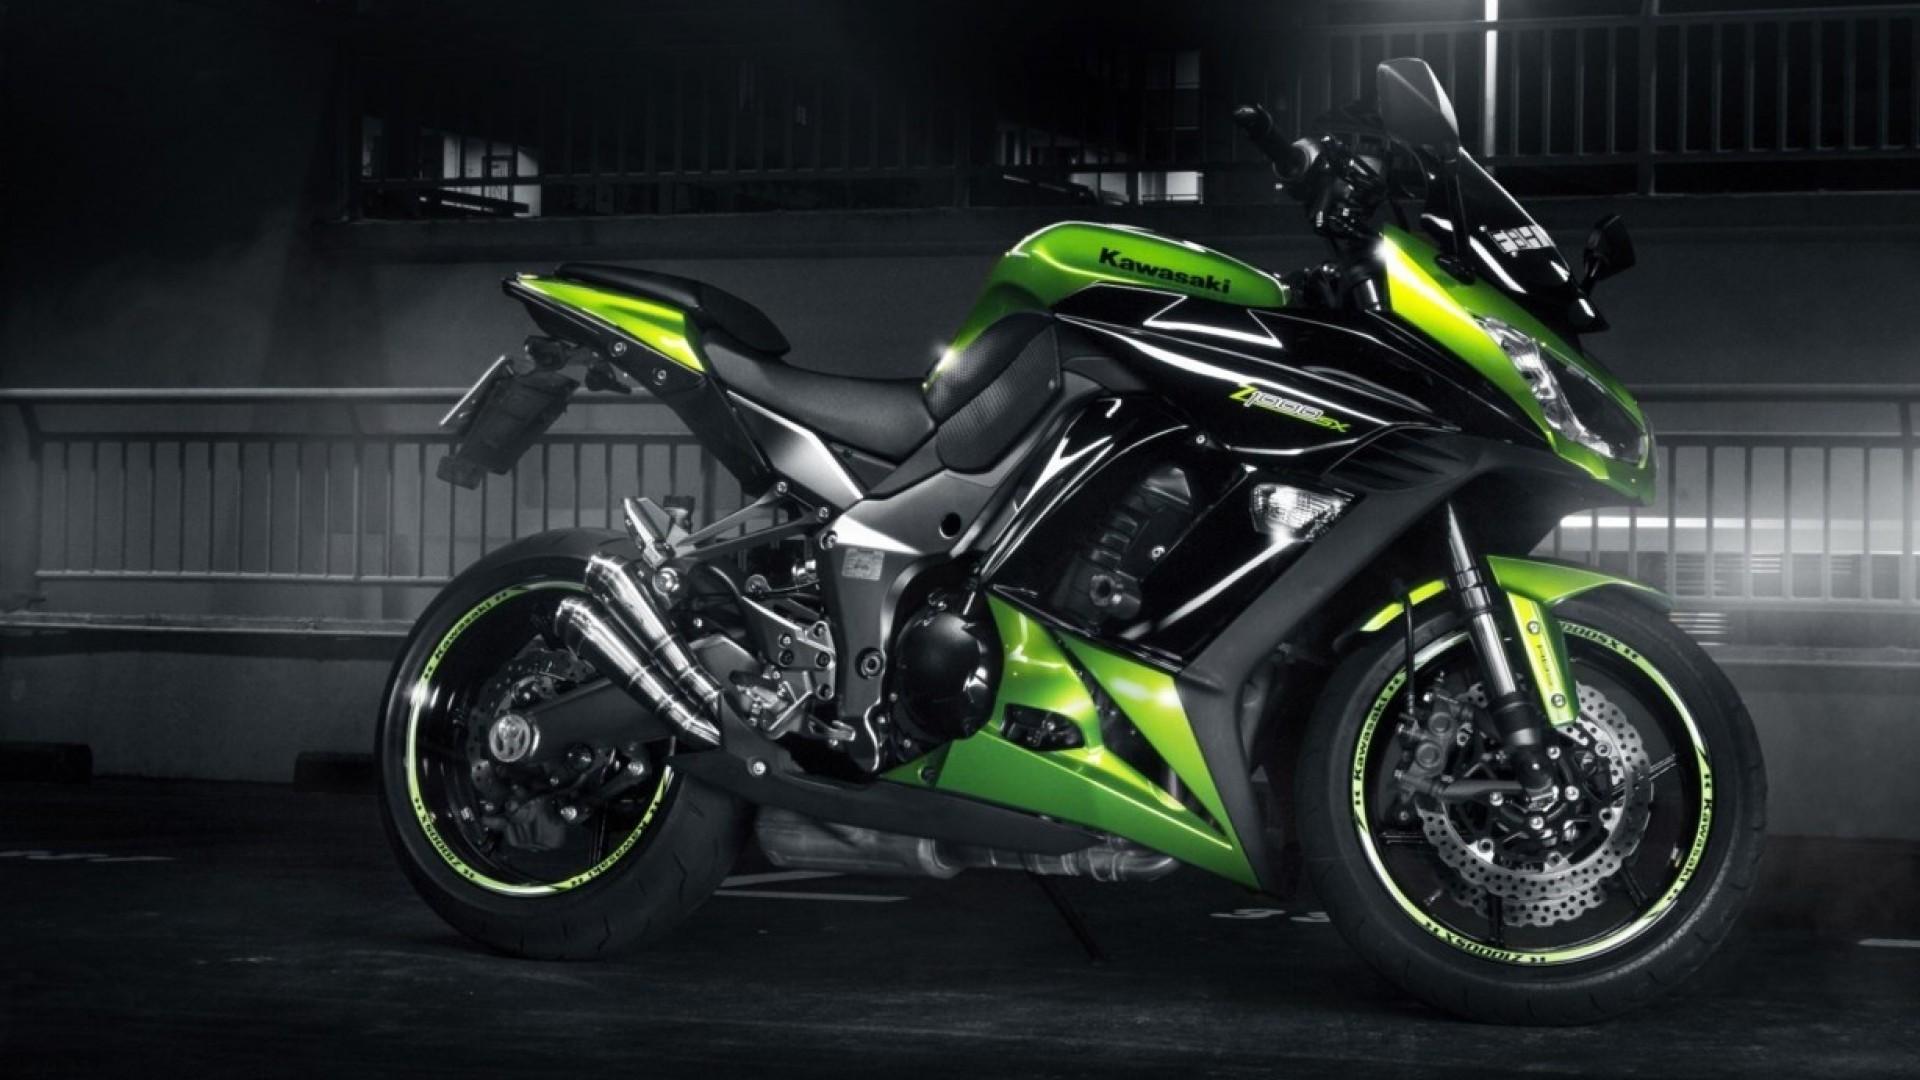 Cool Green Bike Wallpaper